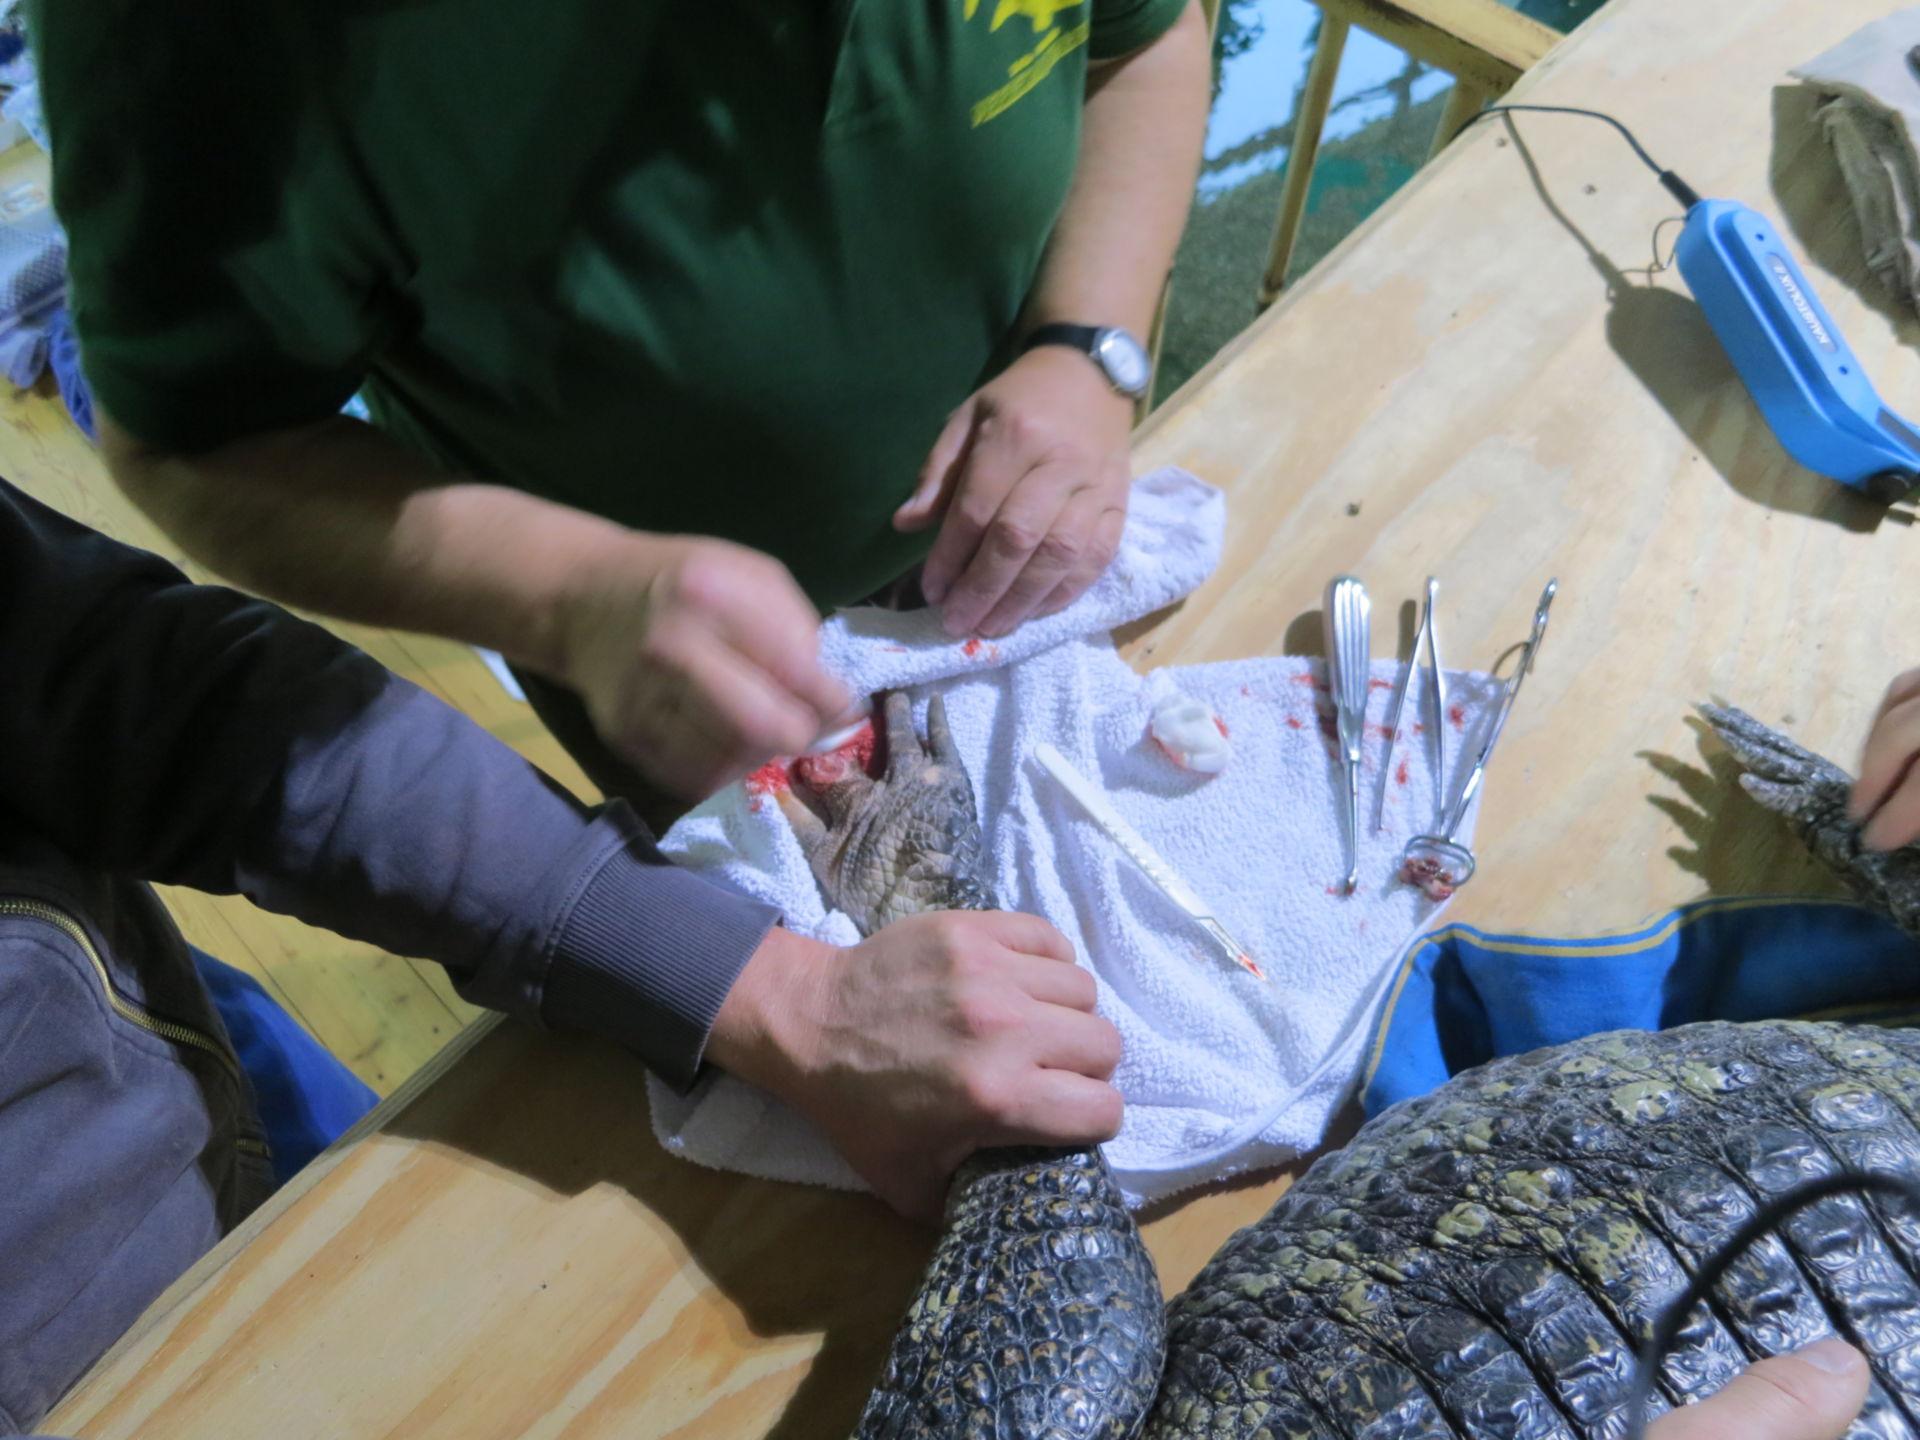 Yacare caiman, granuloma distal phalanx